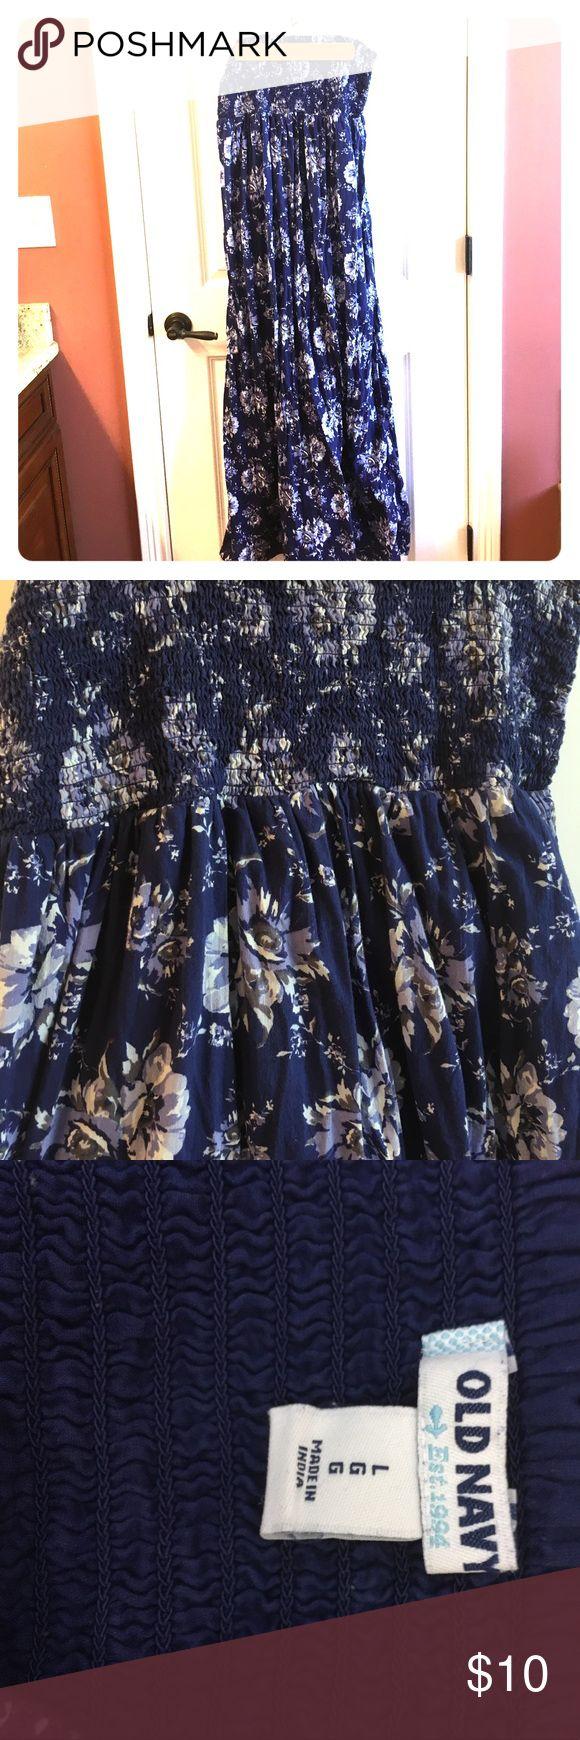 Floral Briny Strapless Maxi Dress Beautiful floral print strapless maxi dress in shades of navy/purple. Flawless. Dog friendly. Smoke free. Old Navy Dresses Maxi